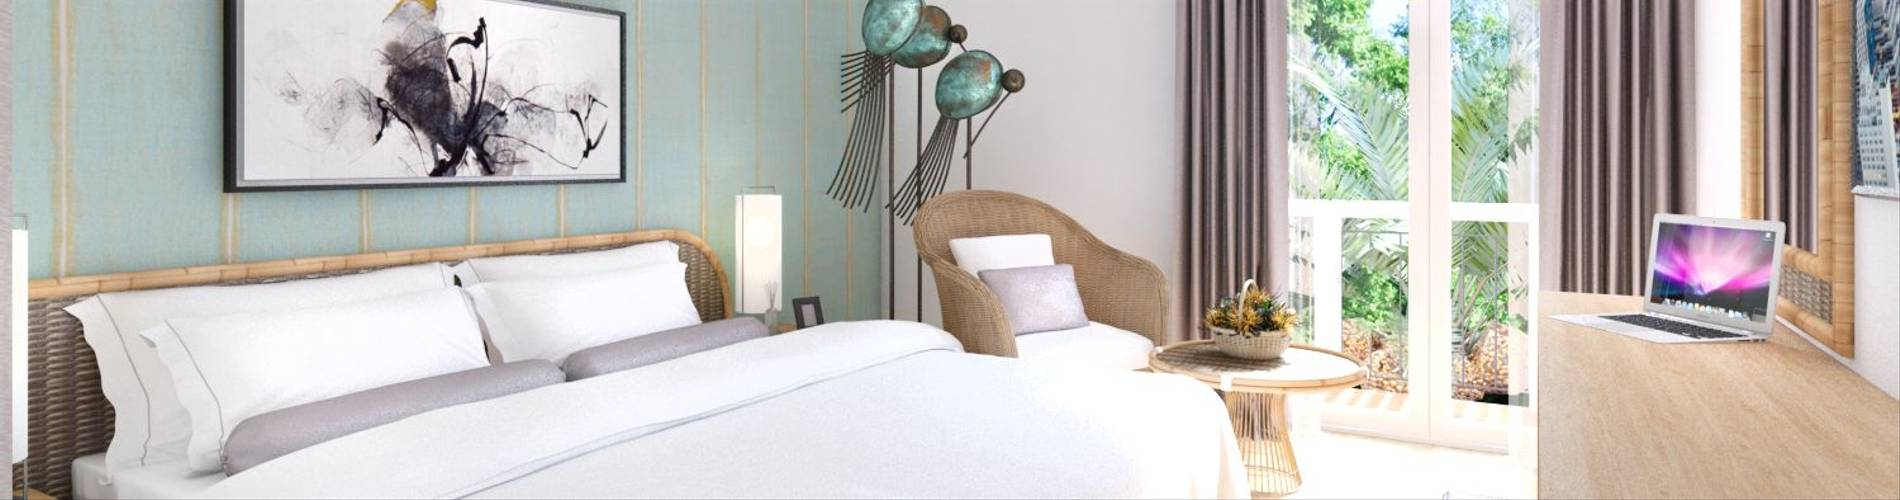 Hotel Villa Adriatica Room 5 2018.jpeg